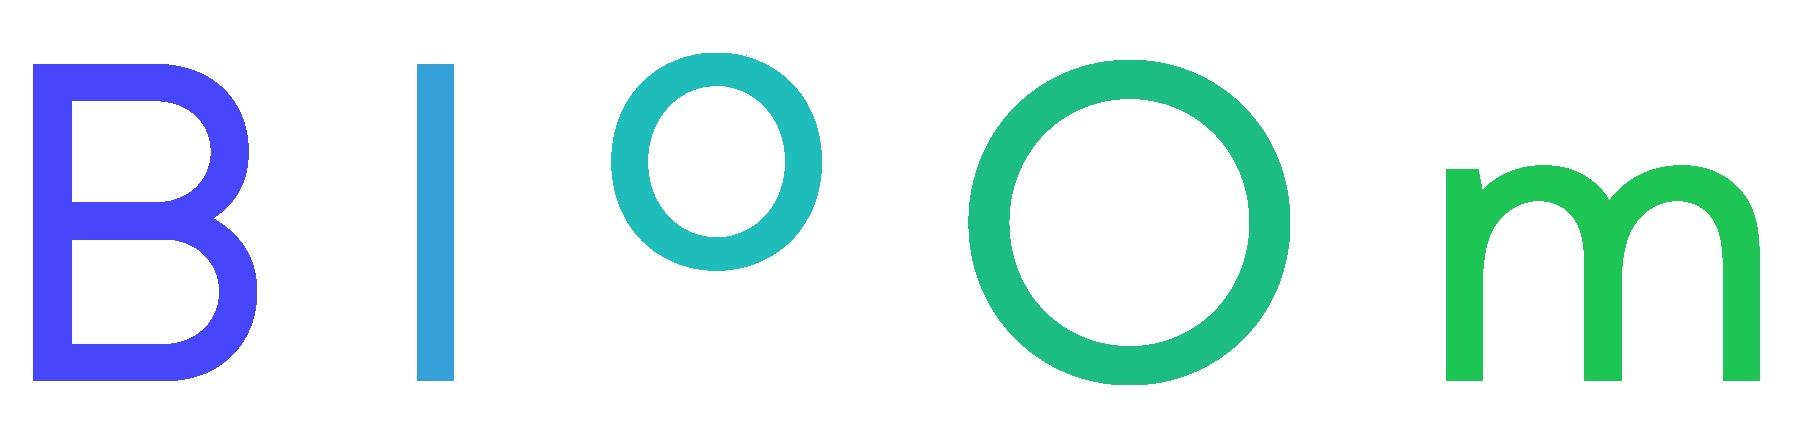 Bloom logo (1) (1)